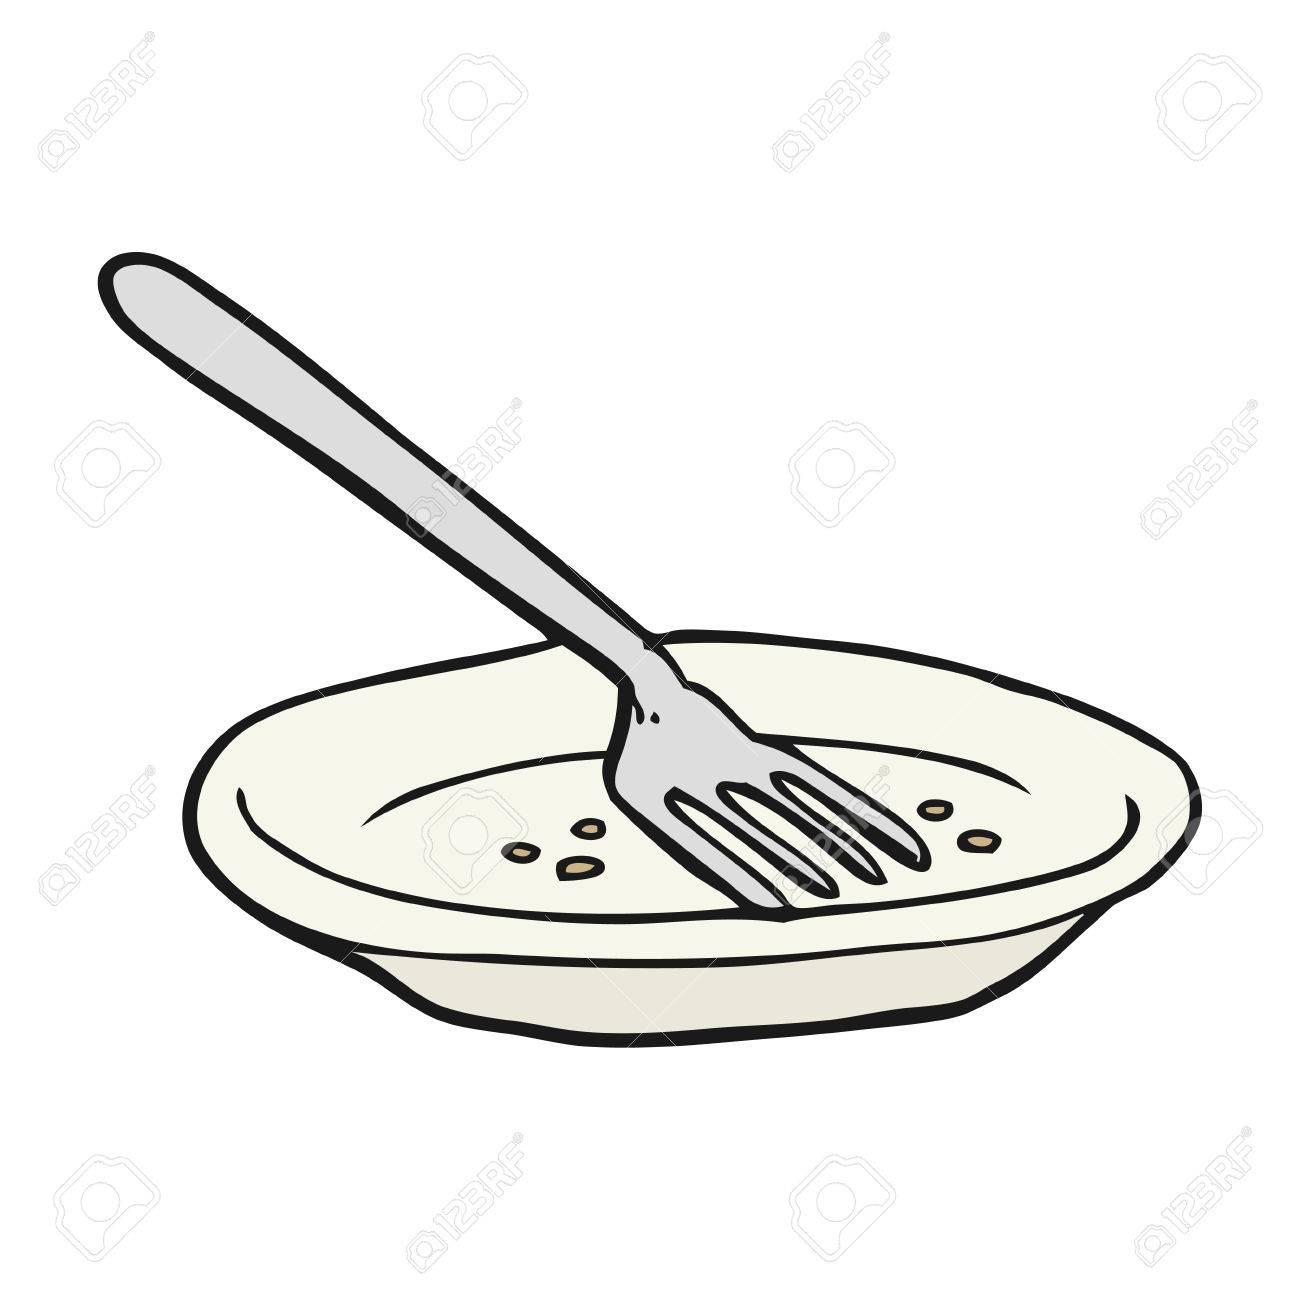 freehand drawn cartoon empty plate.